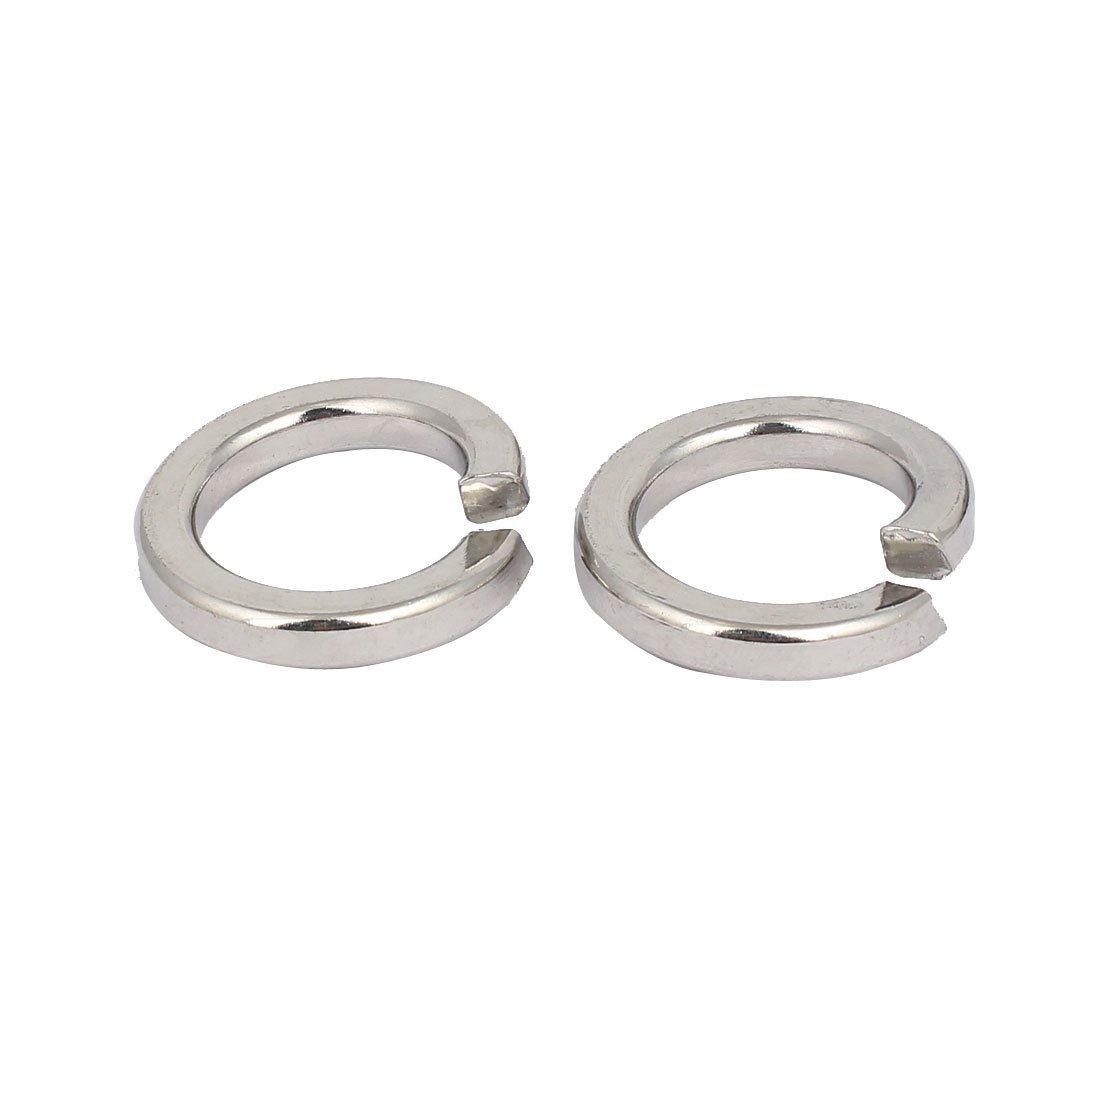 uxcell M22 Inner Diameter 316 Stainless Steel Split Lock Spring Washers Gasket 2pcs